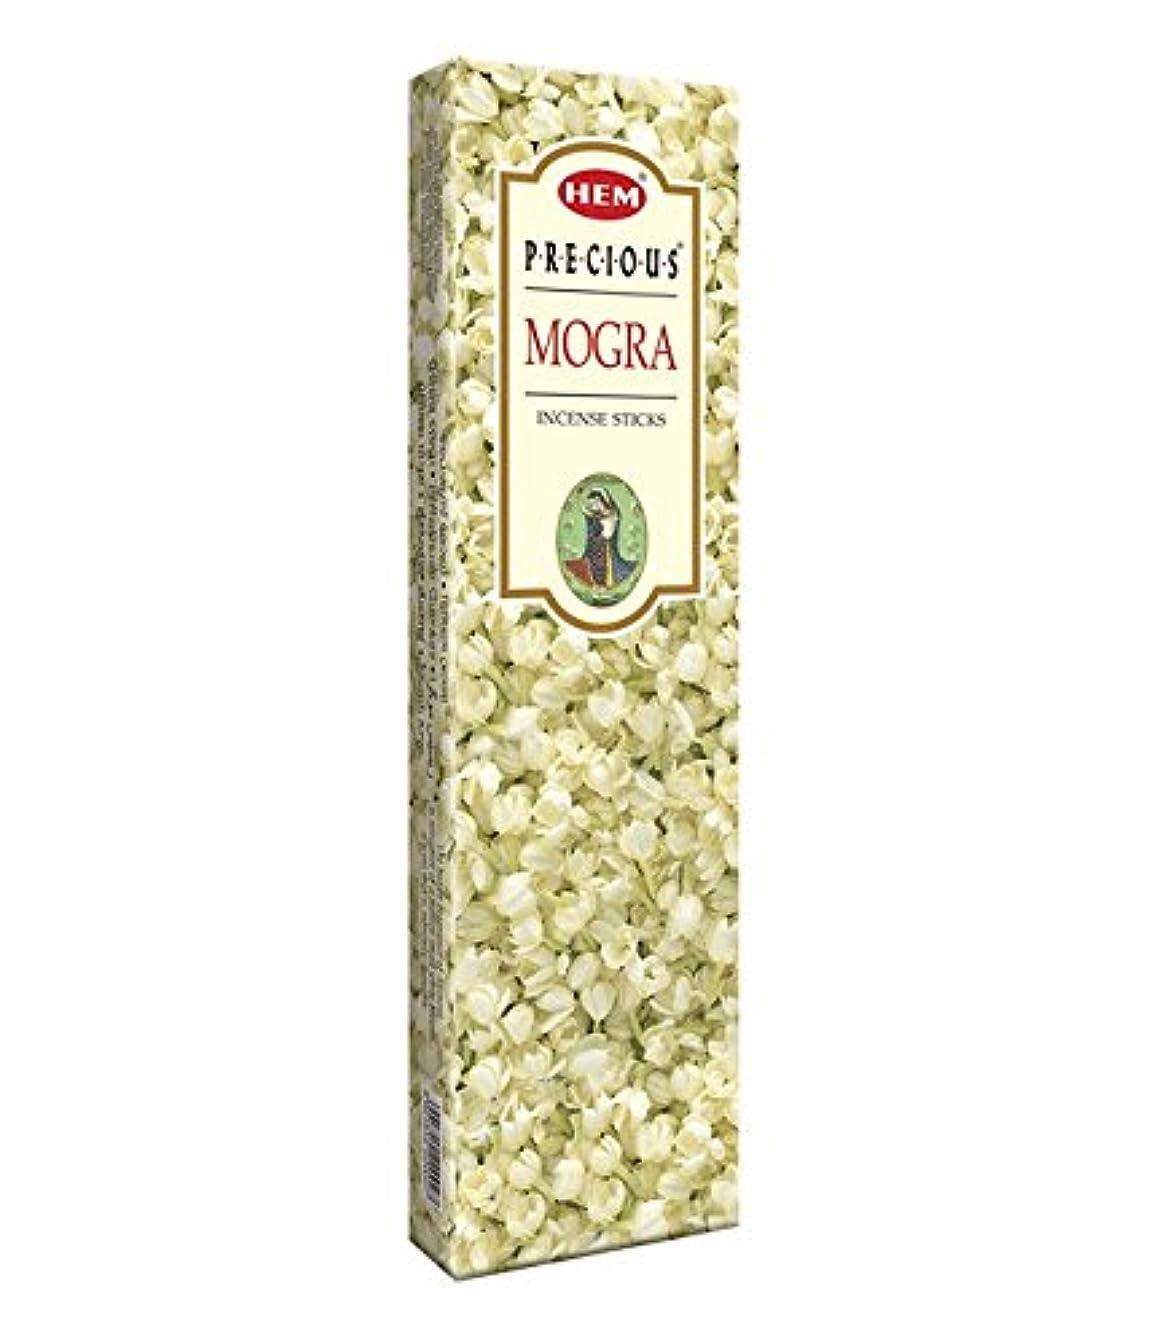 十分抽象新聞Agarbathi Fragrance Hem Precious Mogra 100 g INCENSE STICKS